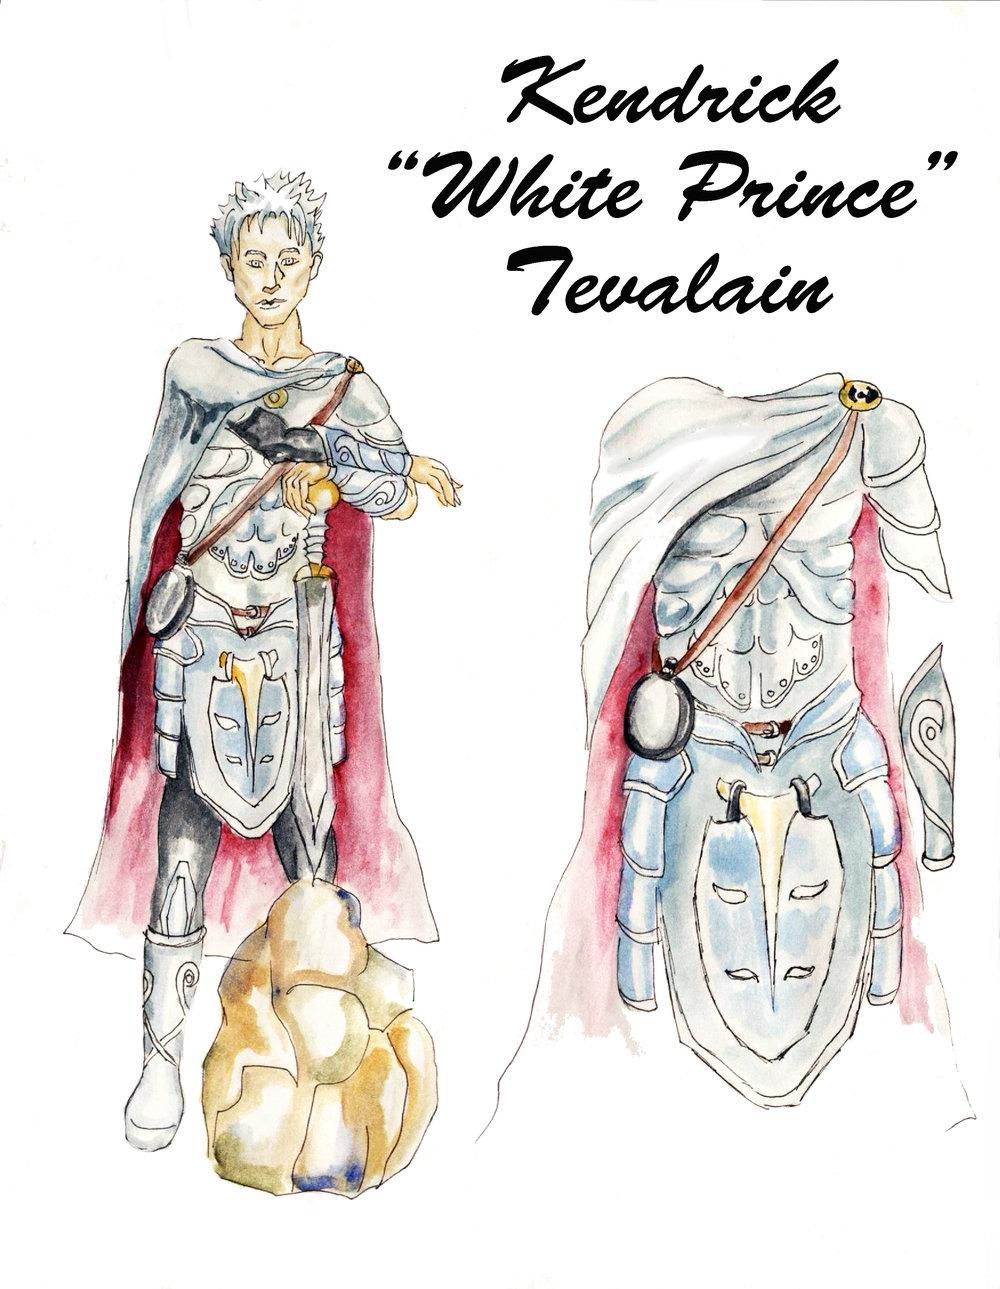 Kendrick White Prince Tevalain.jpg